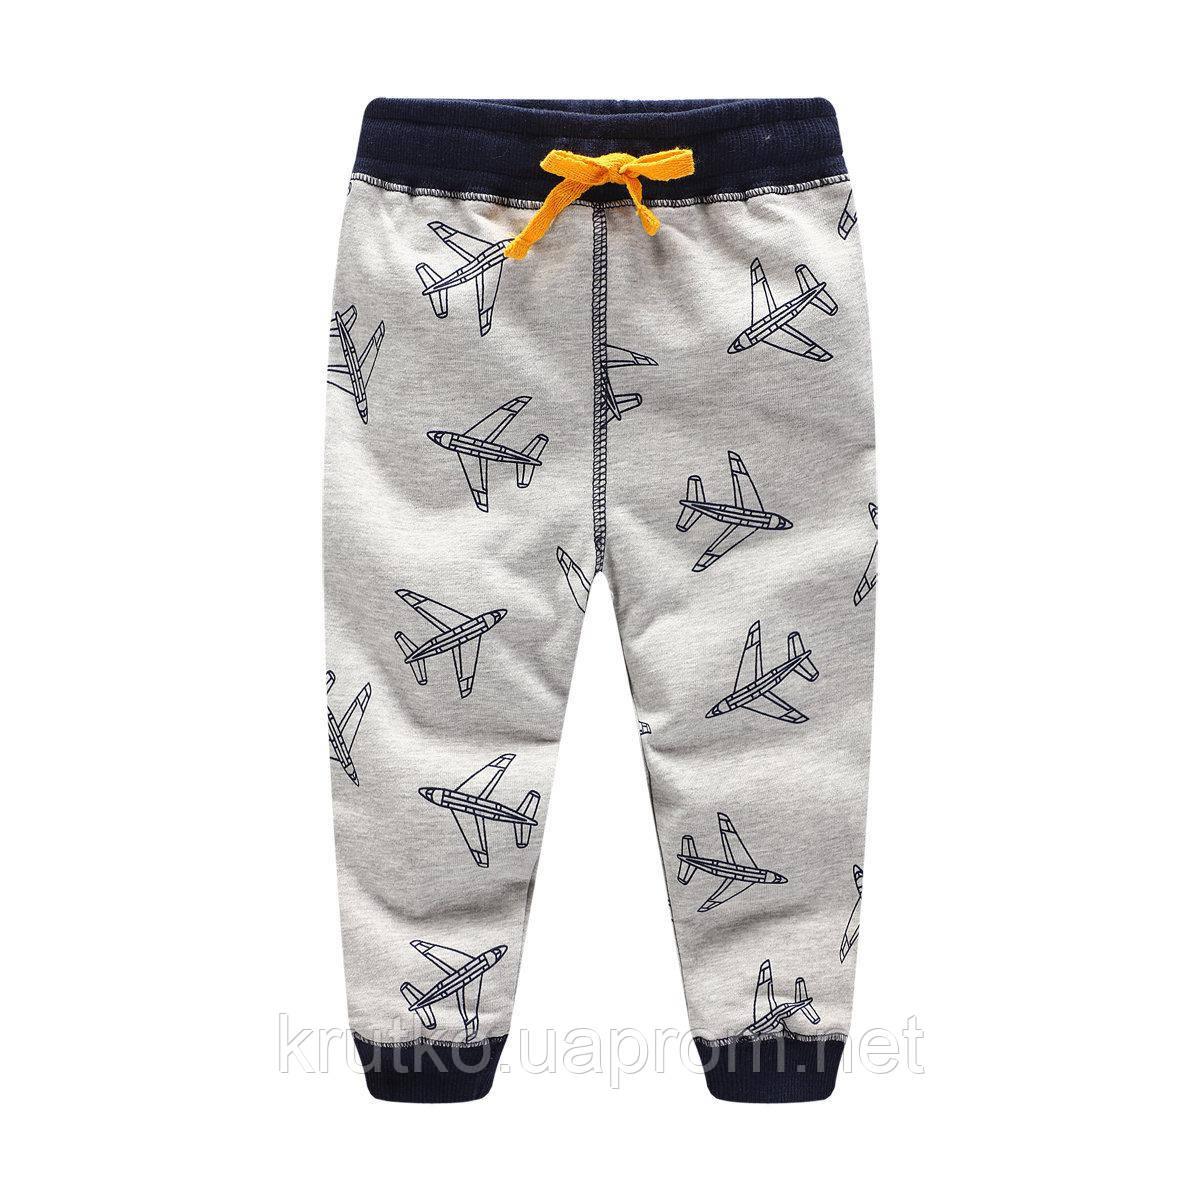 Штаны для мальчика Самолет Jumping Meters